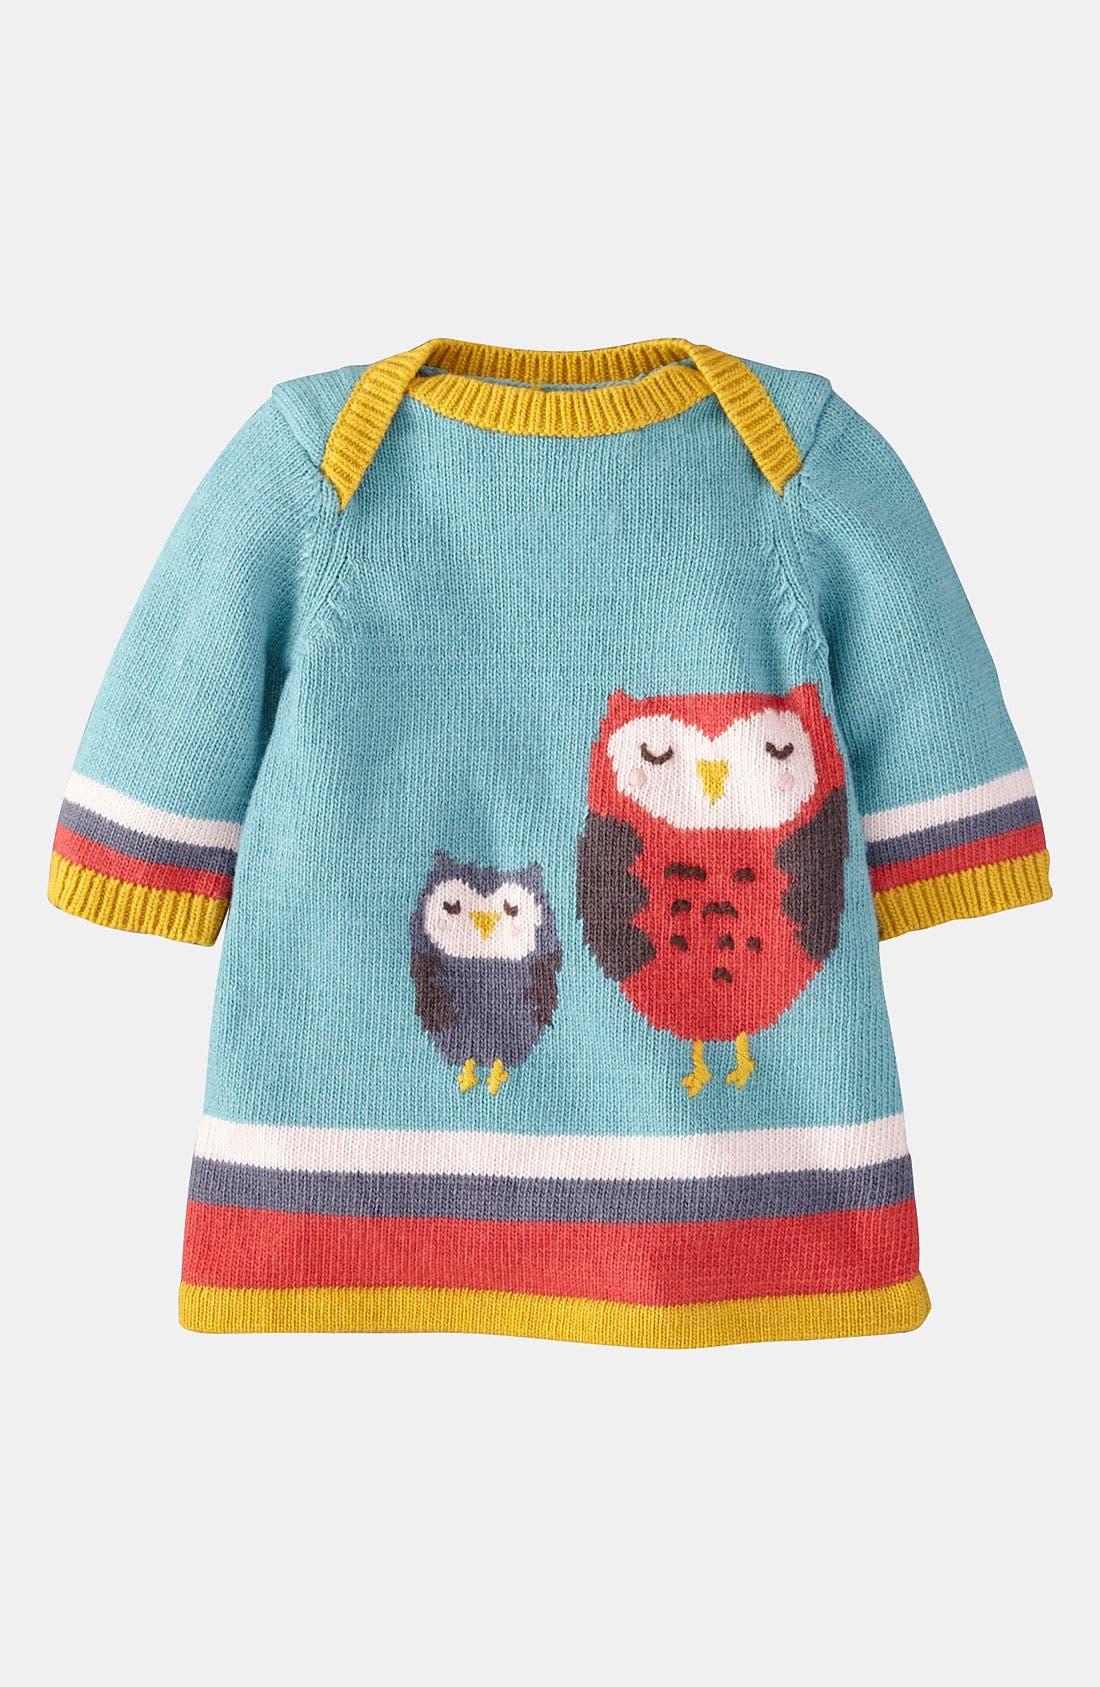 'My Baby' Knit Dress,                         Main,                         color, Powder Blue/ Owls